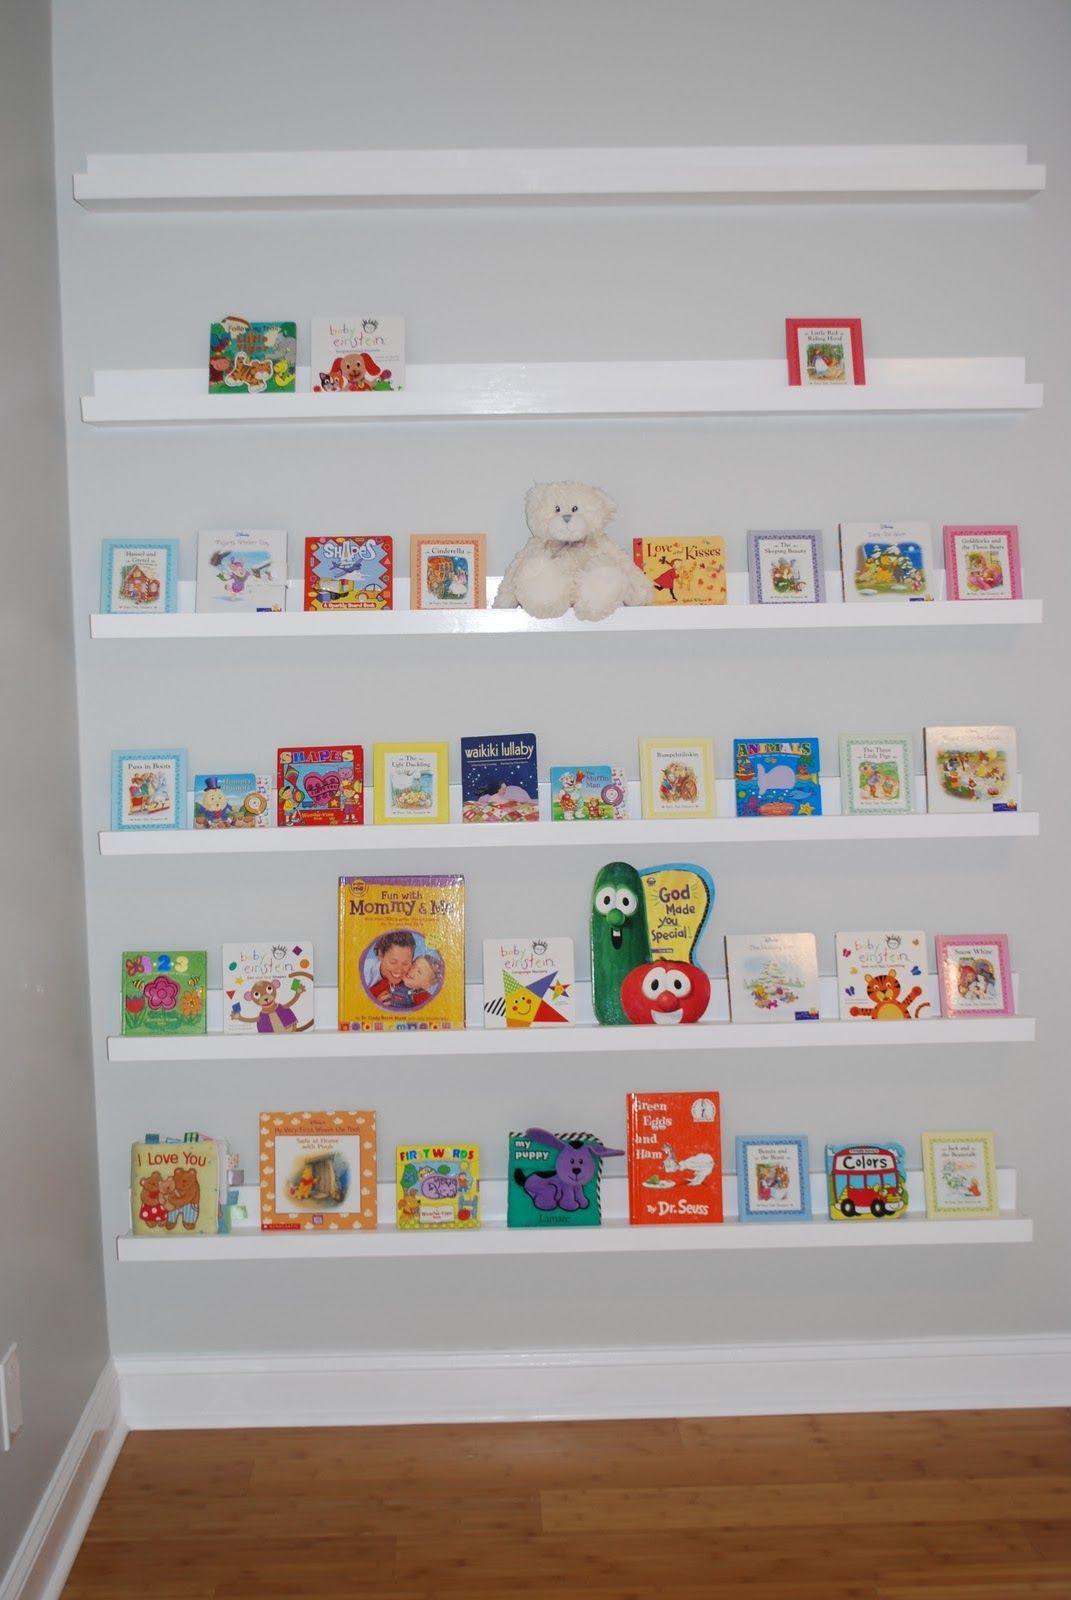 ledge shelf ideas nursery room book shelves from 10 ledge plan rh pinterest com ikea book ledge shelves ikea book ledge shelves